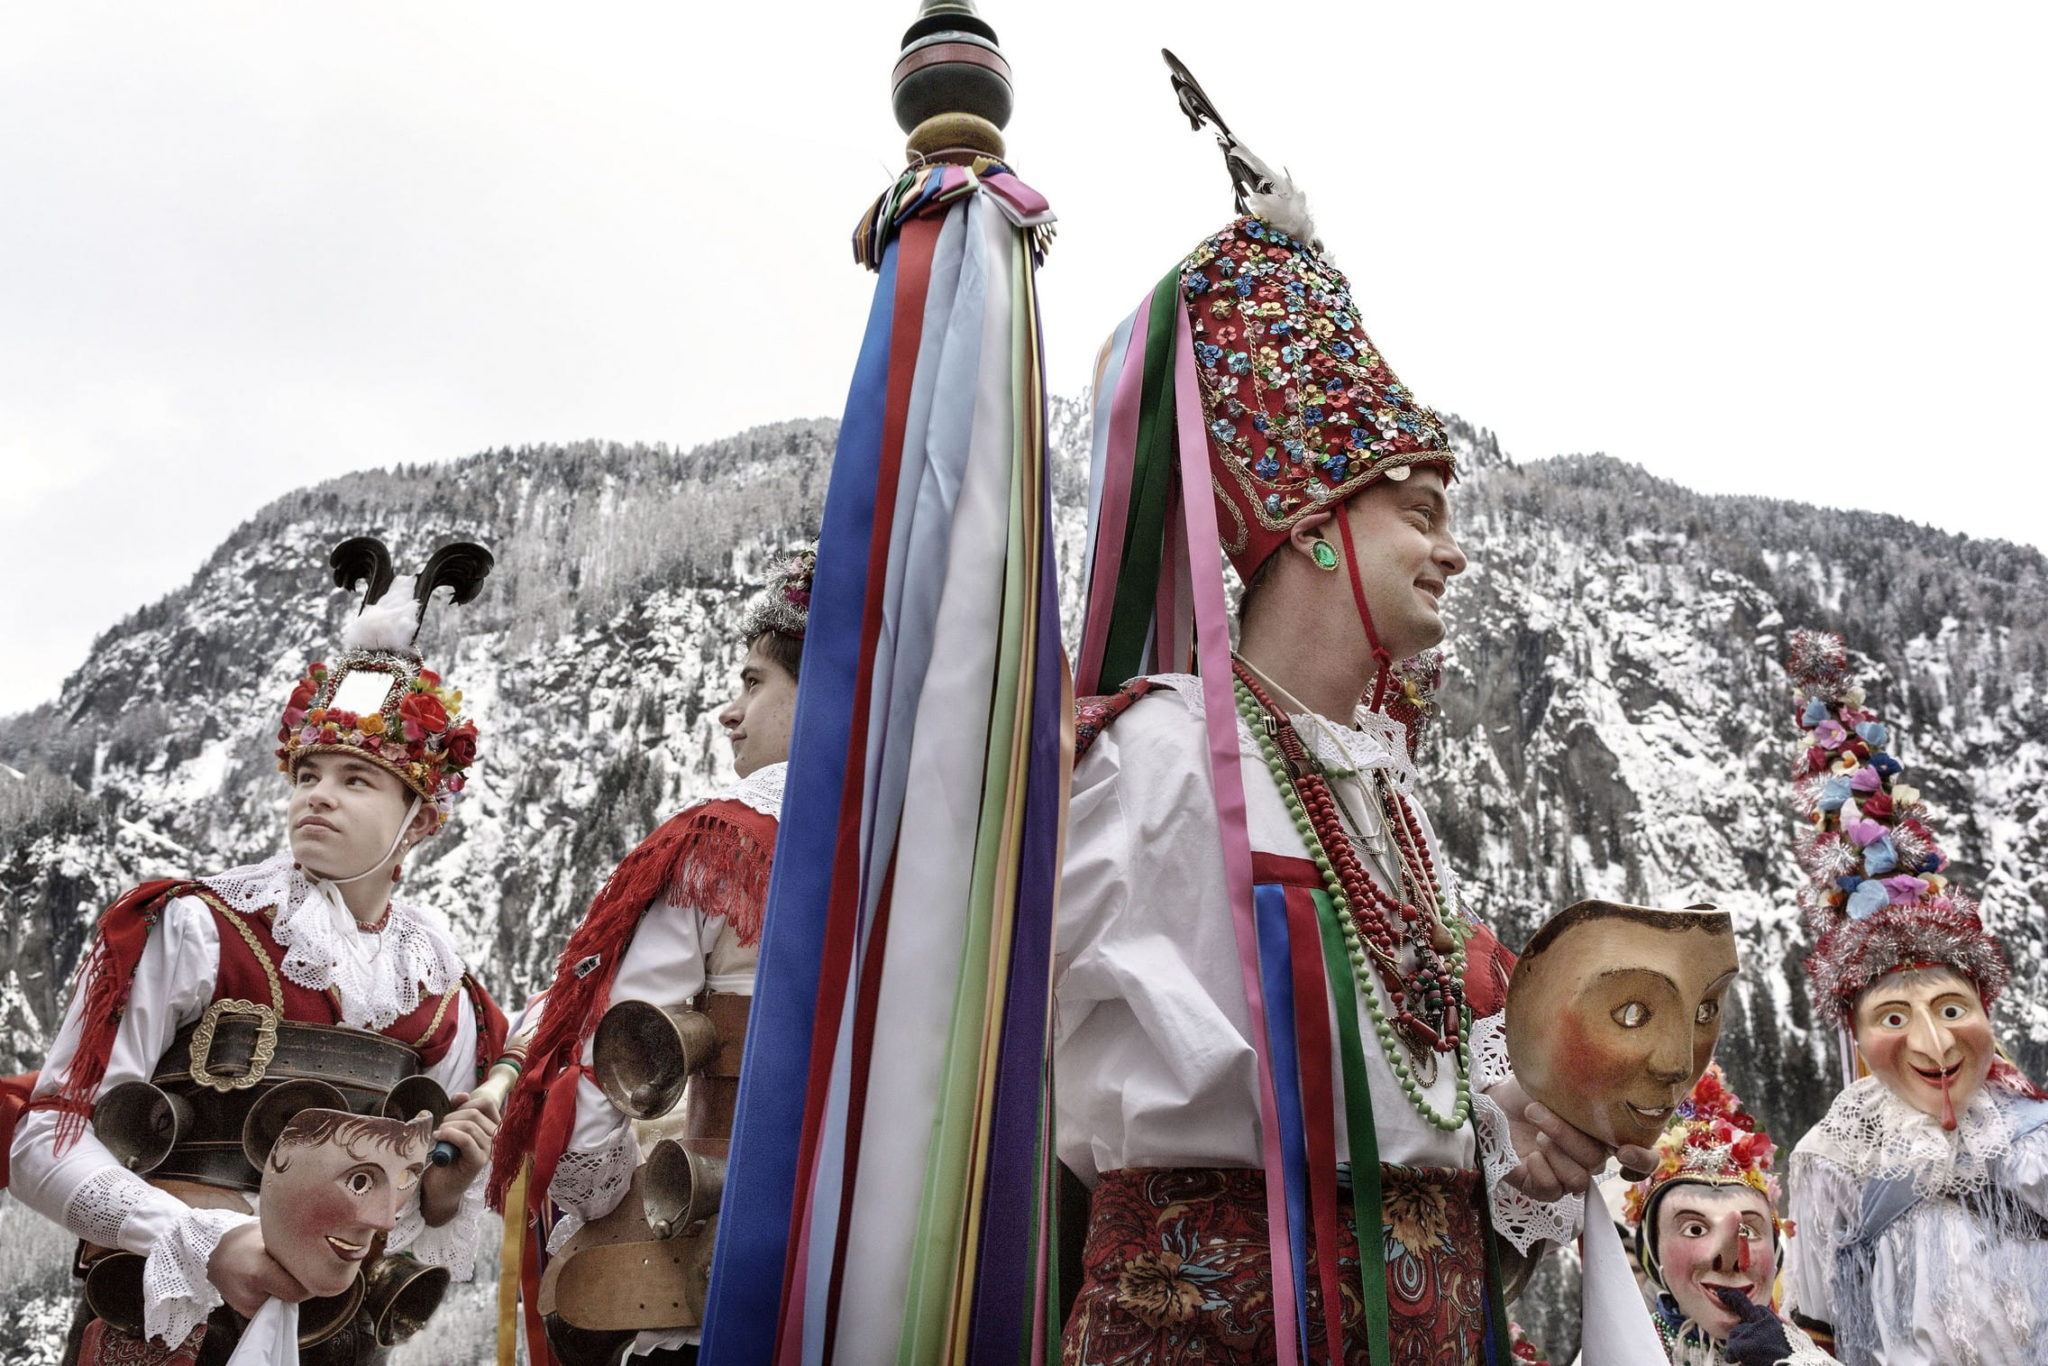 Carnevale Ladino in Trentino - foto Daniele Lira